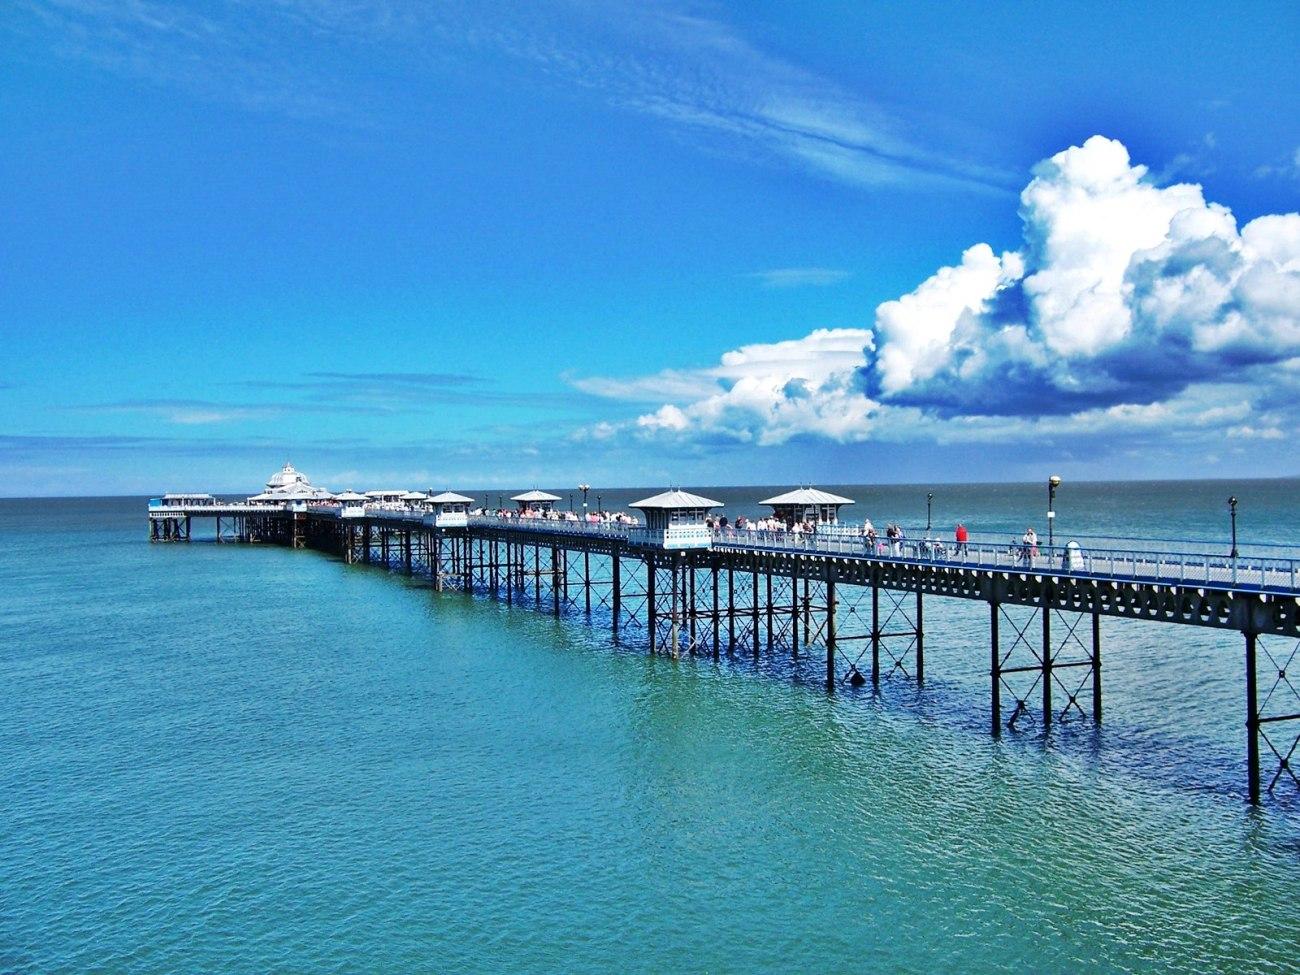 Llandudno Pier, Wales